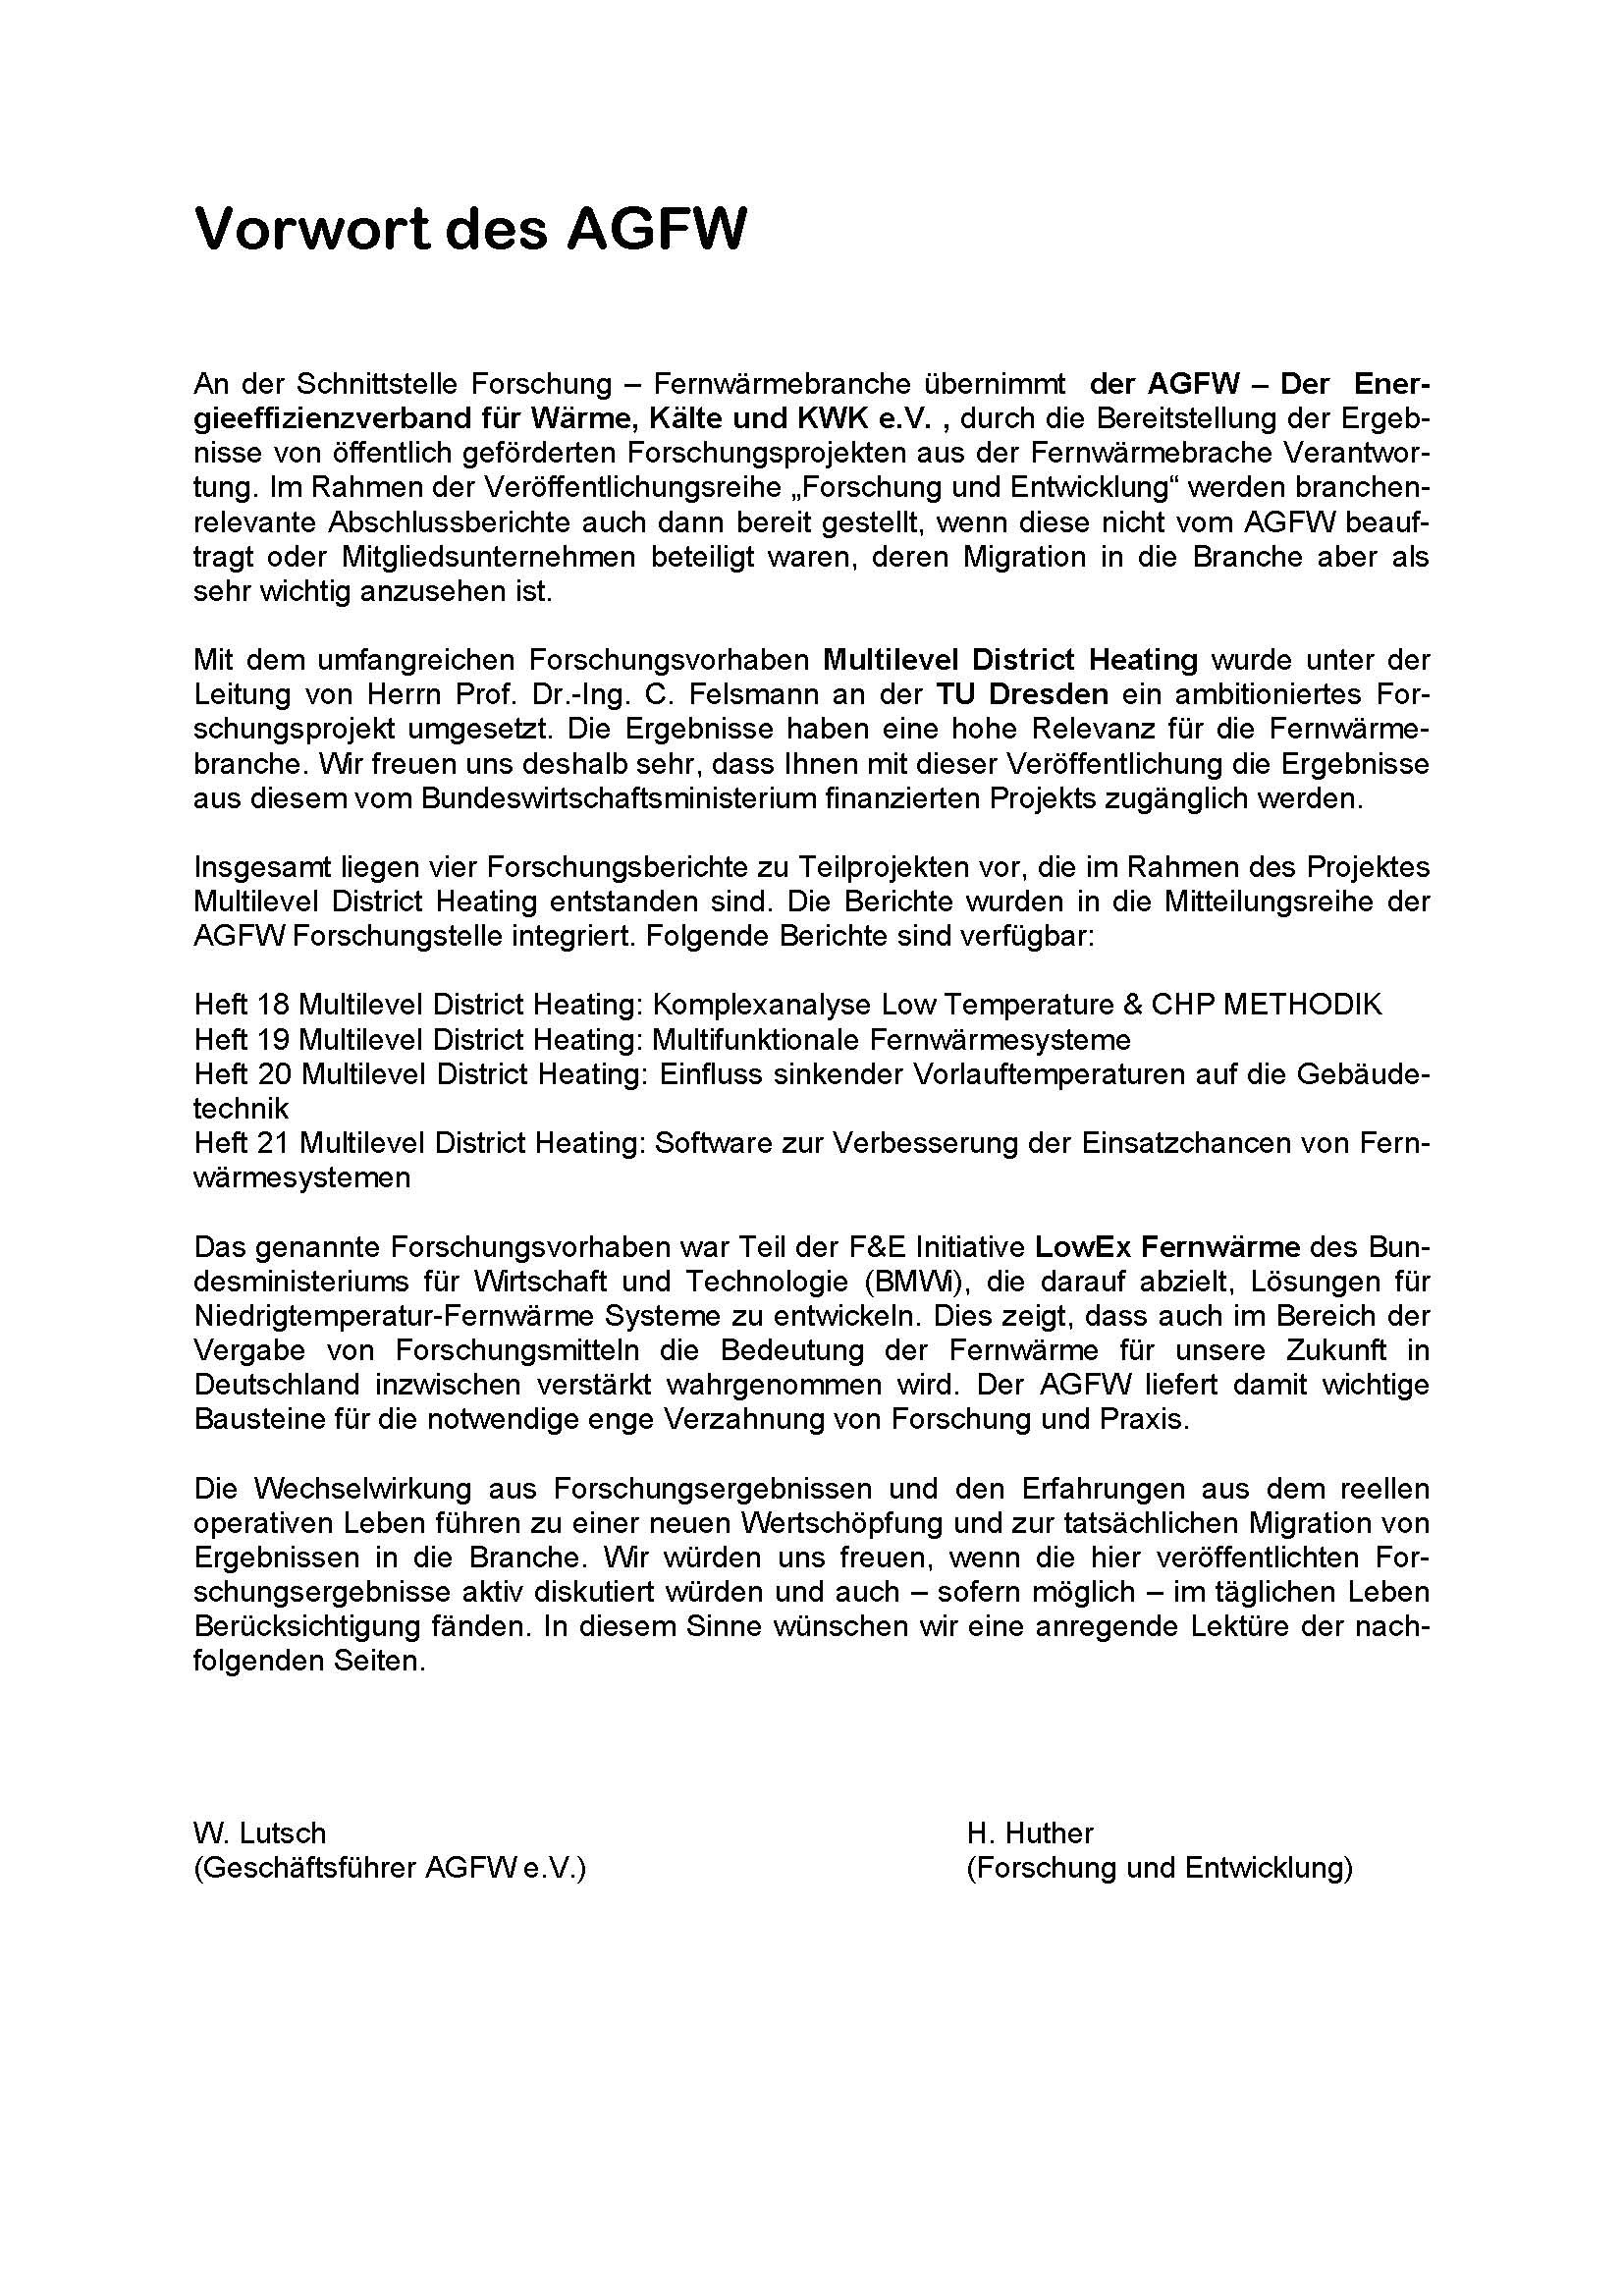 LowEx Fernwärme | Multilevel District Heating | Multifunktionale ...